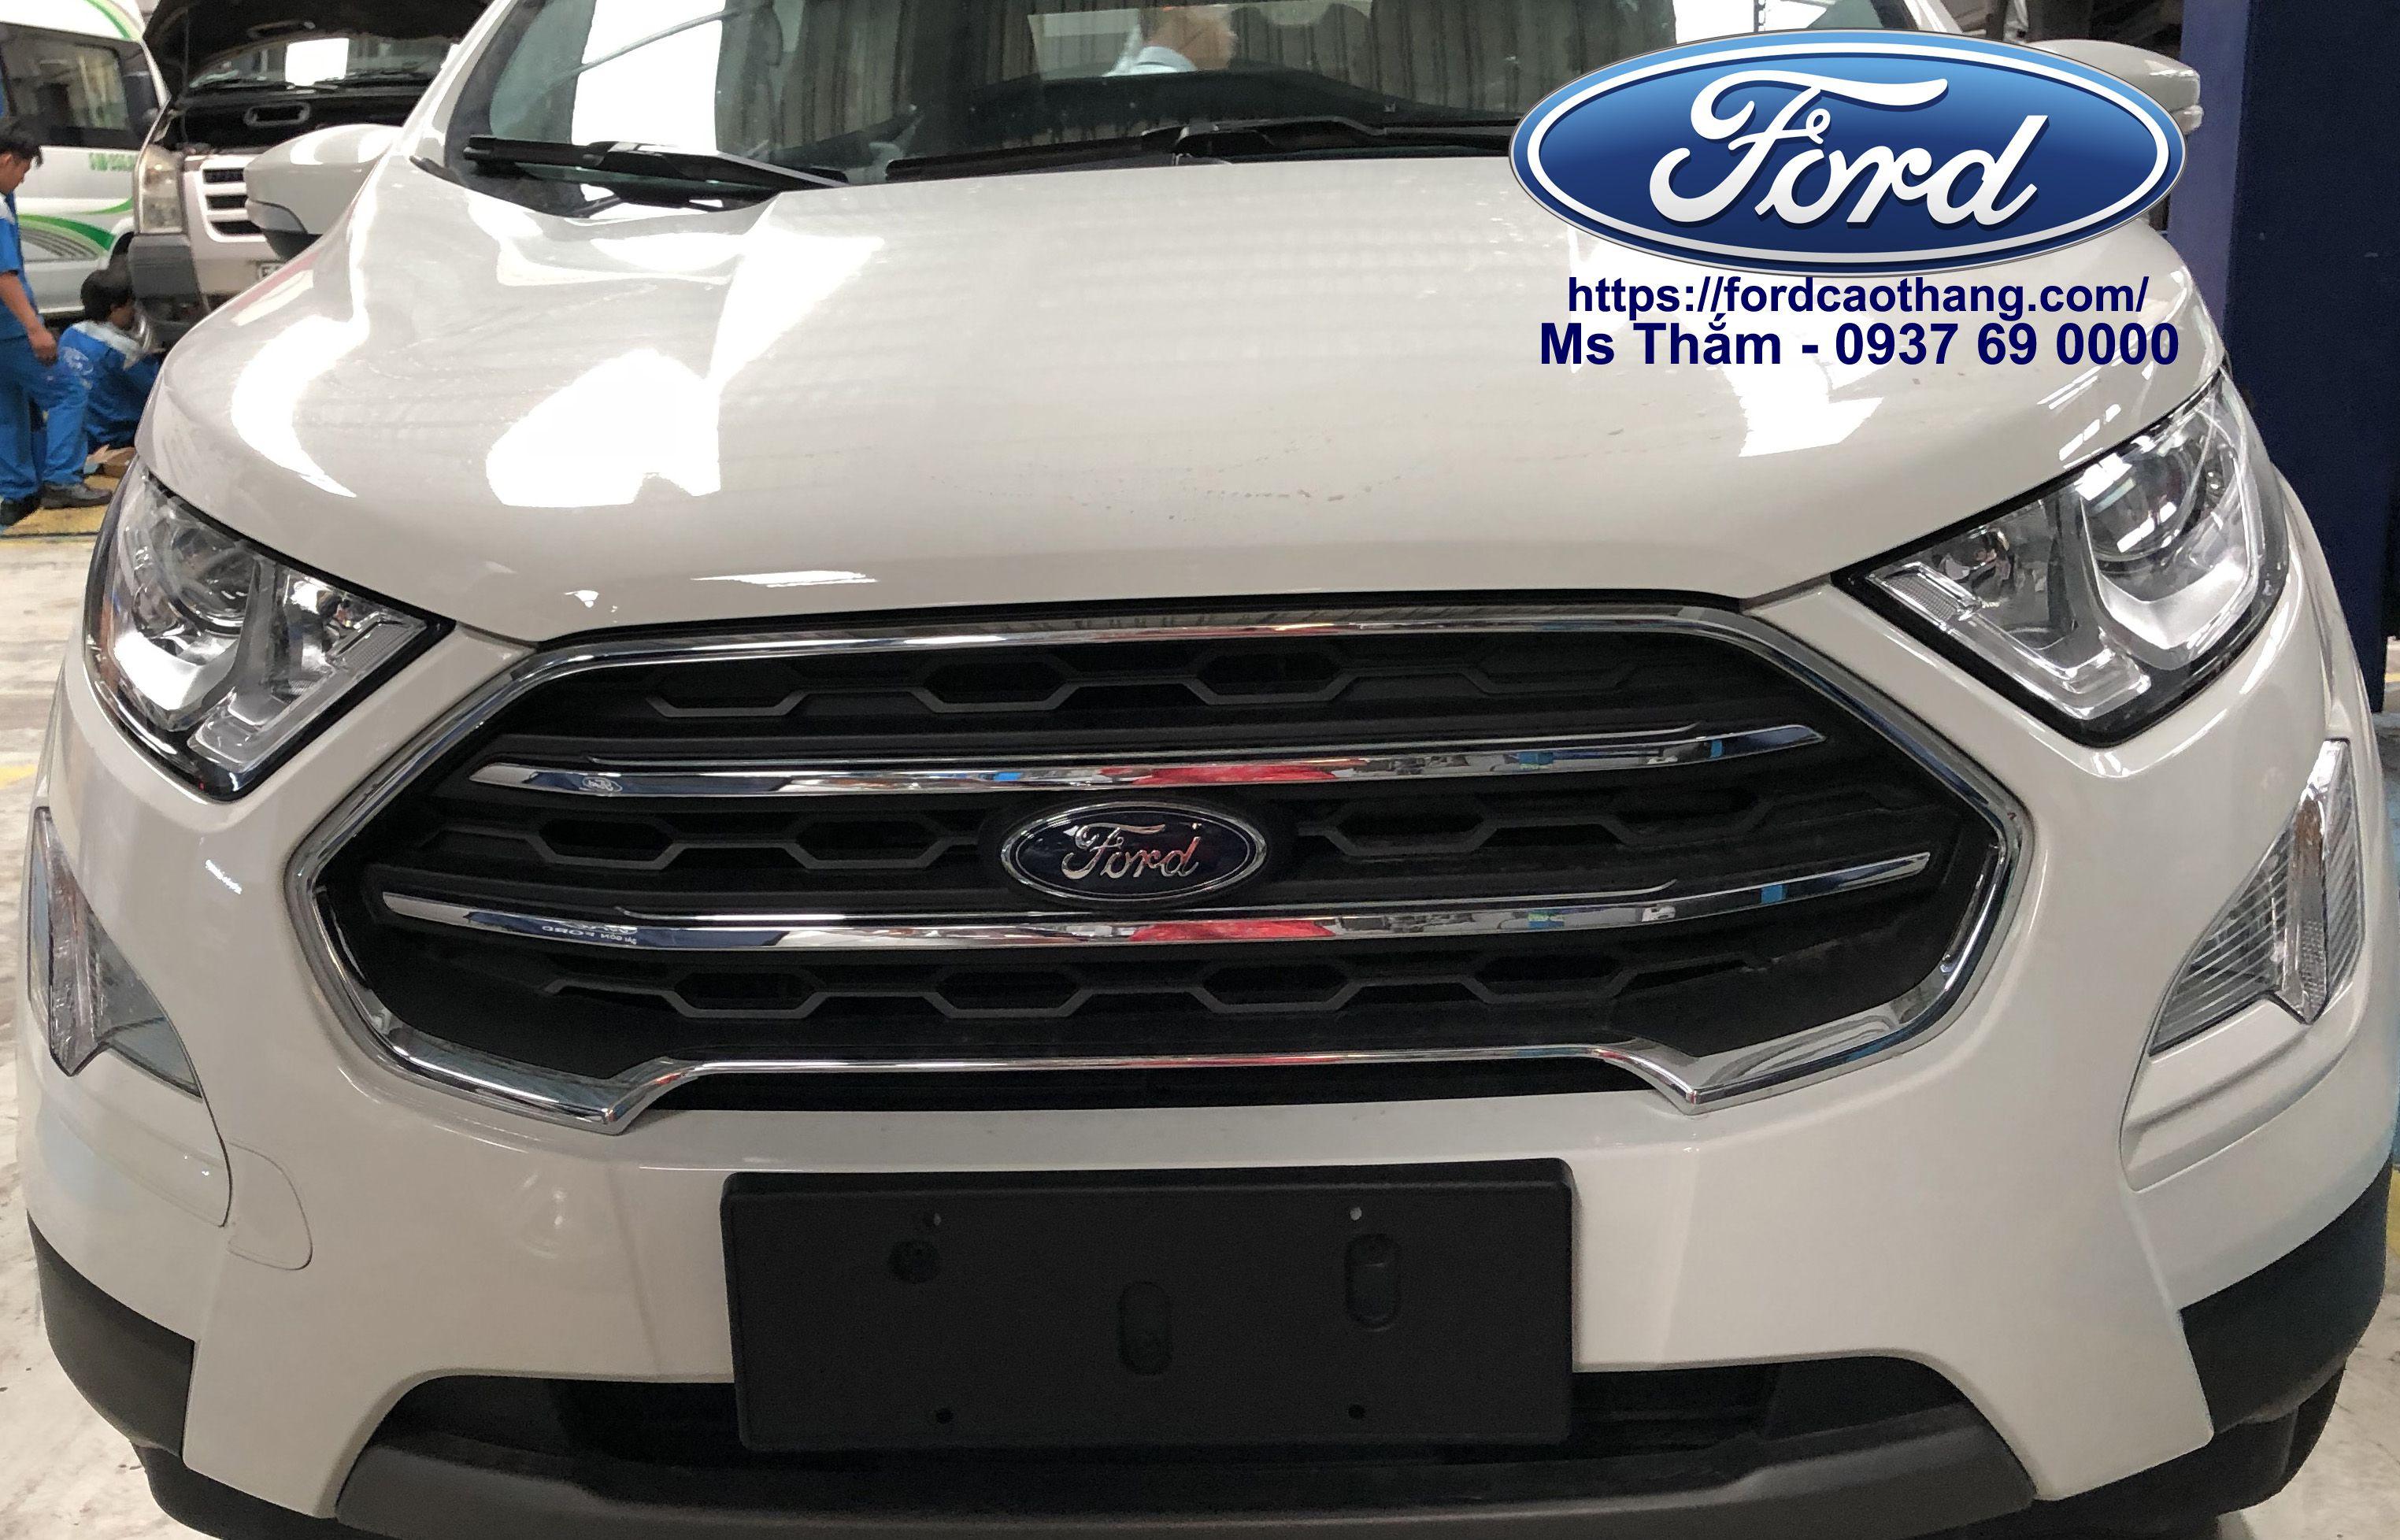 Mua xe Ford Ecosport 2018